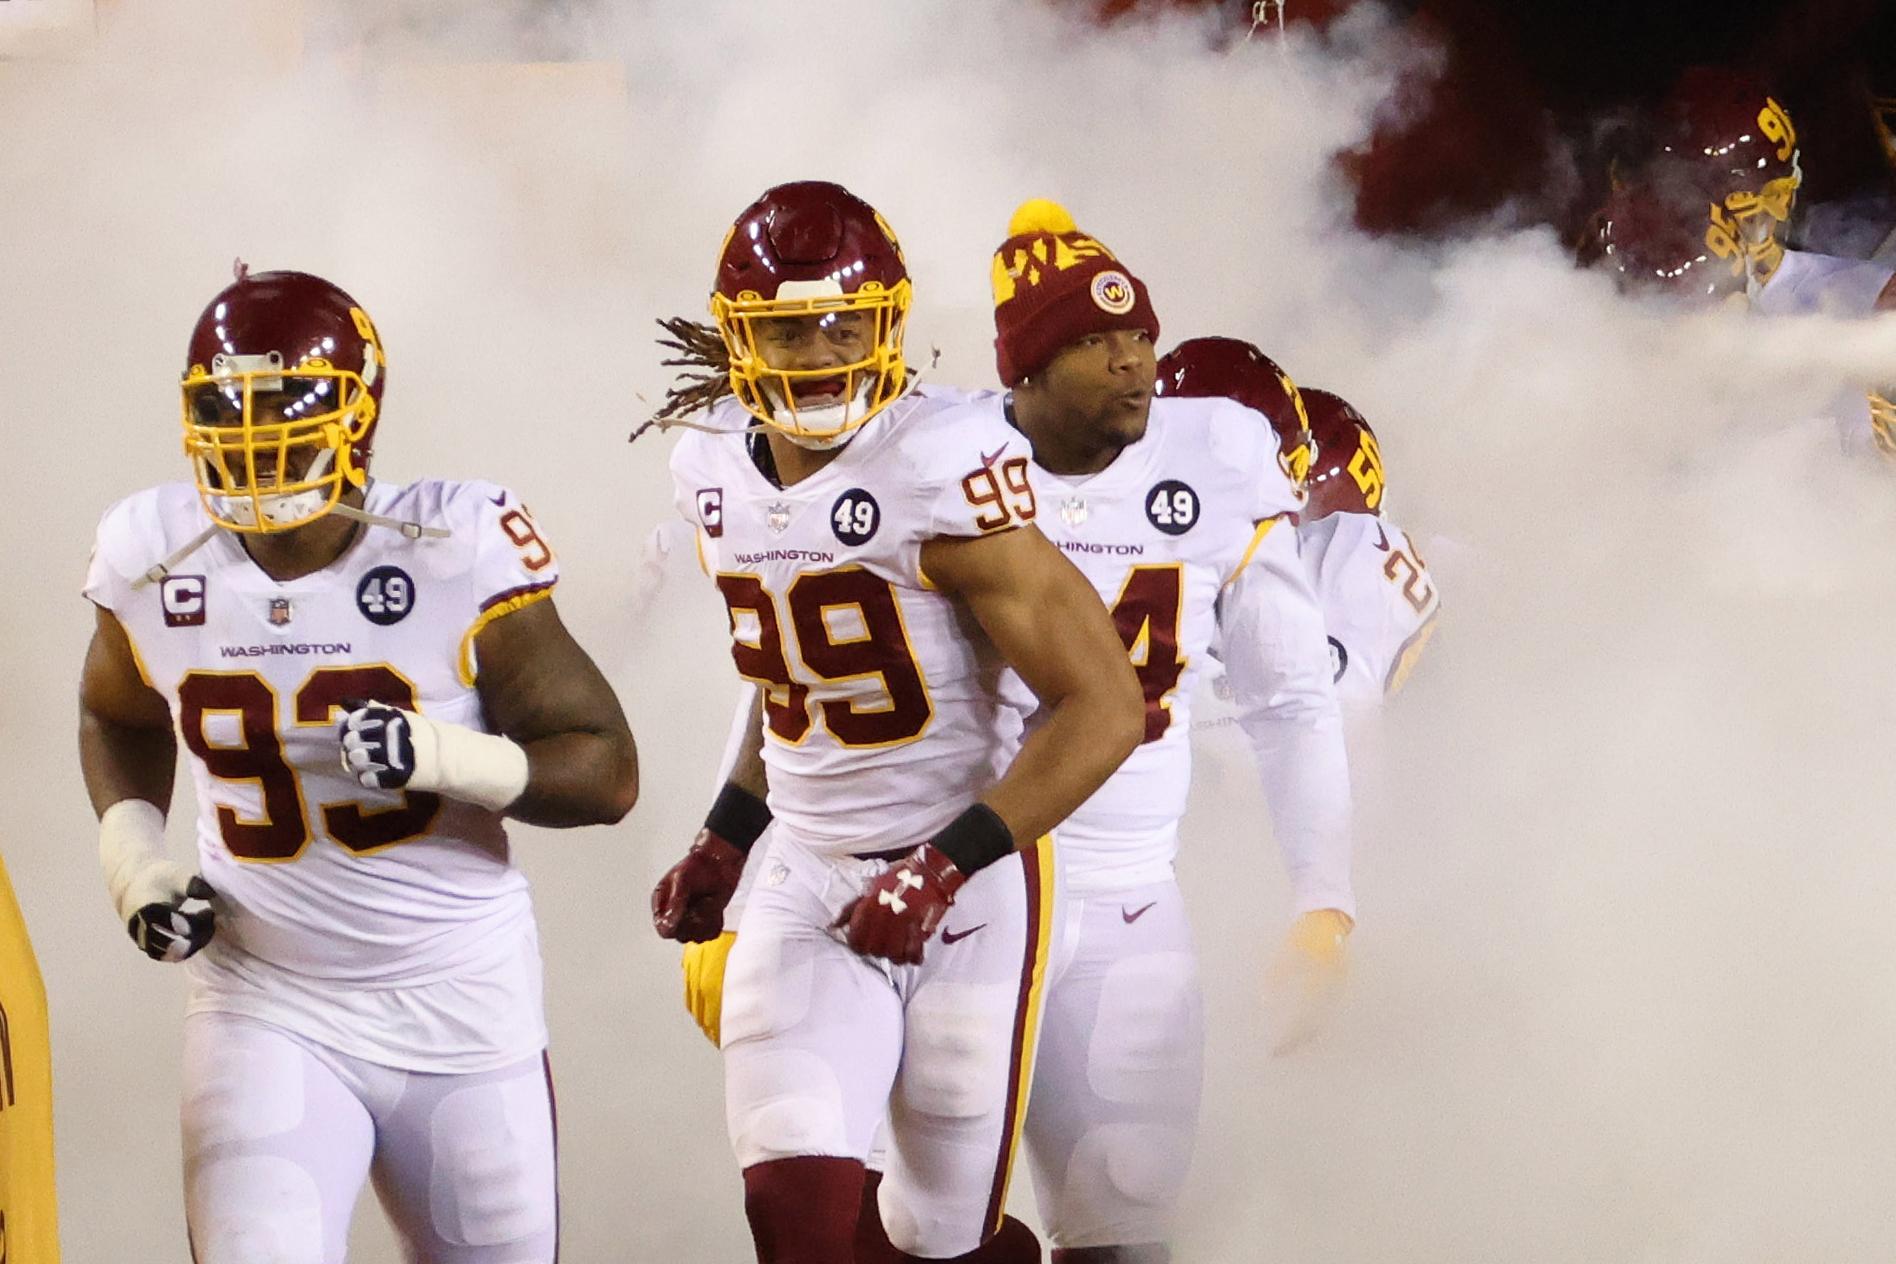 NFL: NFC Wild Card Round-Tampa Bay Buccaneers at Washington Football Team